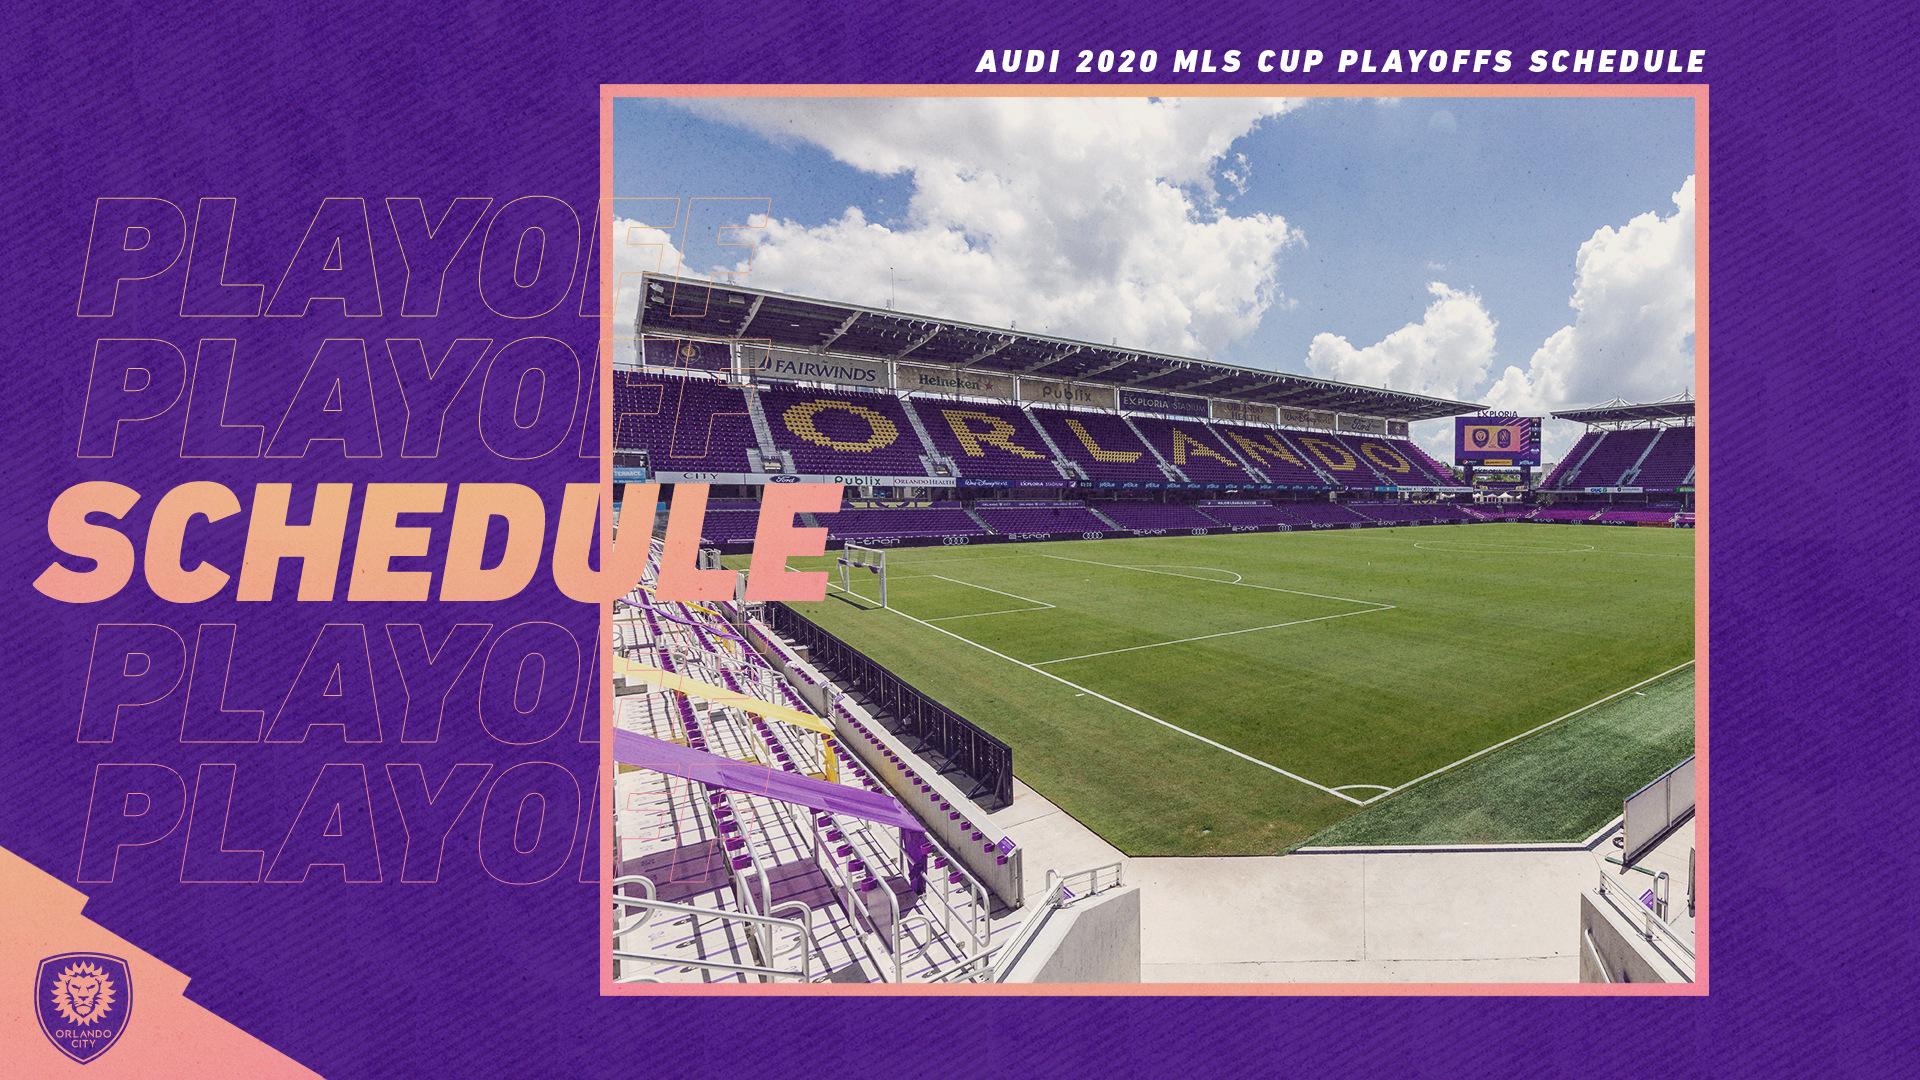 MLS Announces Audi 2020 MLS Cup Playoffs Schedule | Orlando City